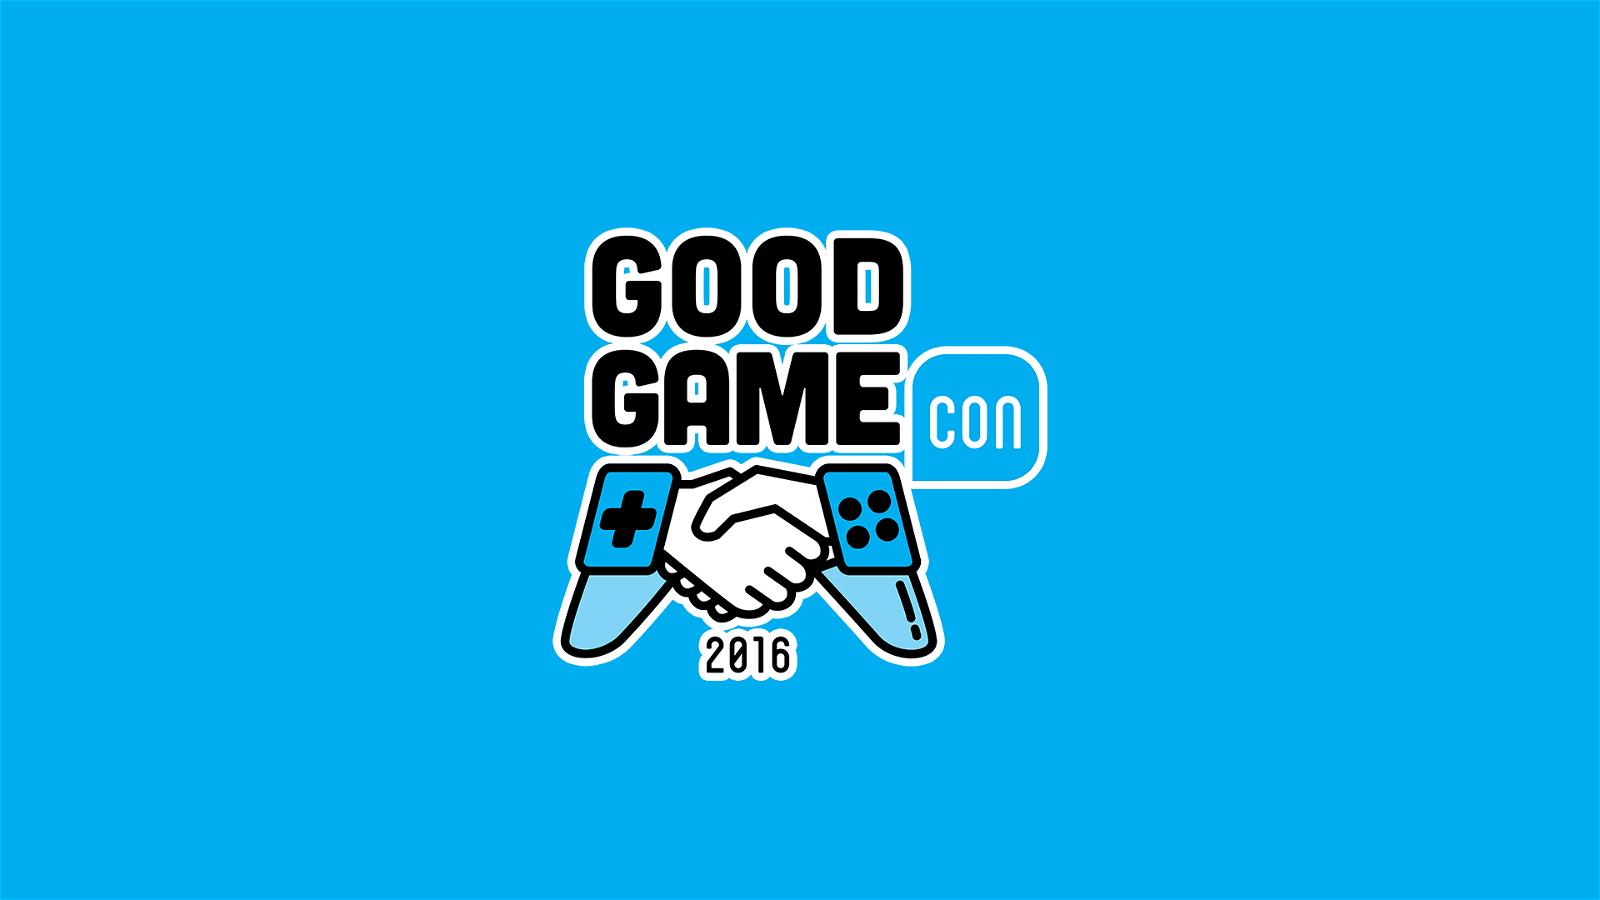 Good Game Con: Growing Canada's eSports Scene 22